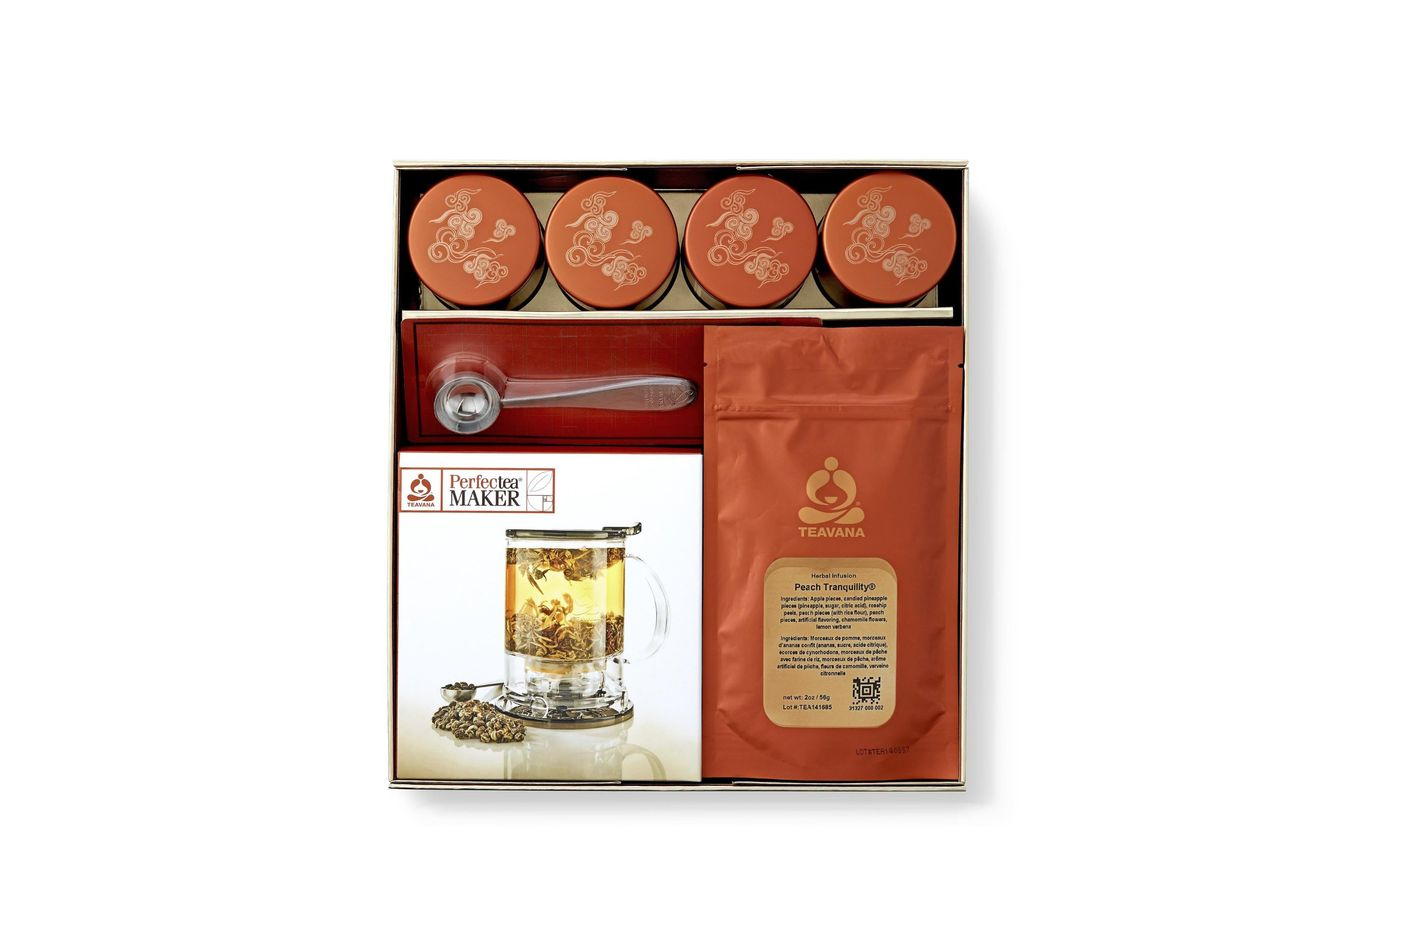 Teavana Artisanal Collection Brewing Kit